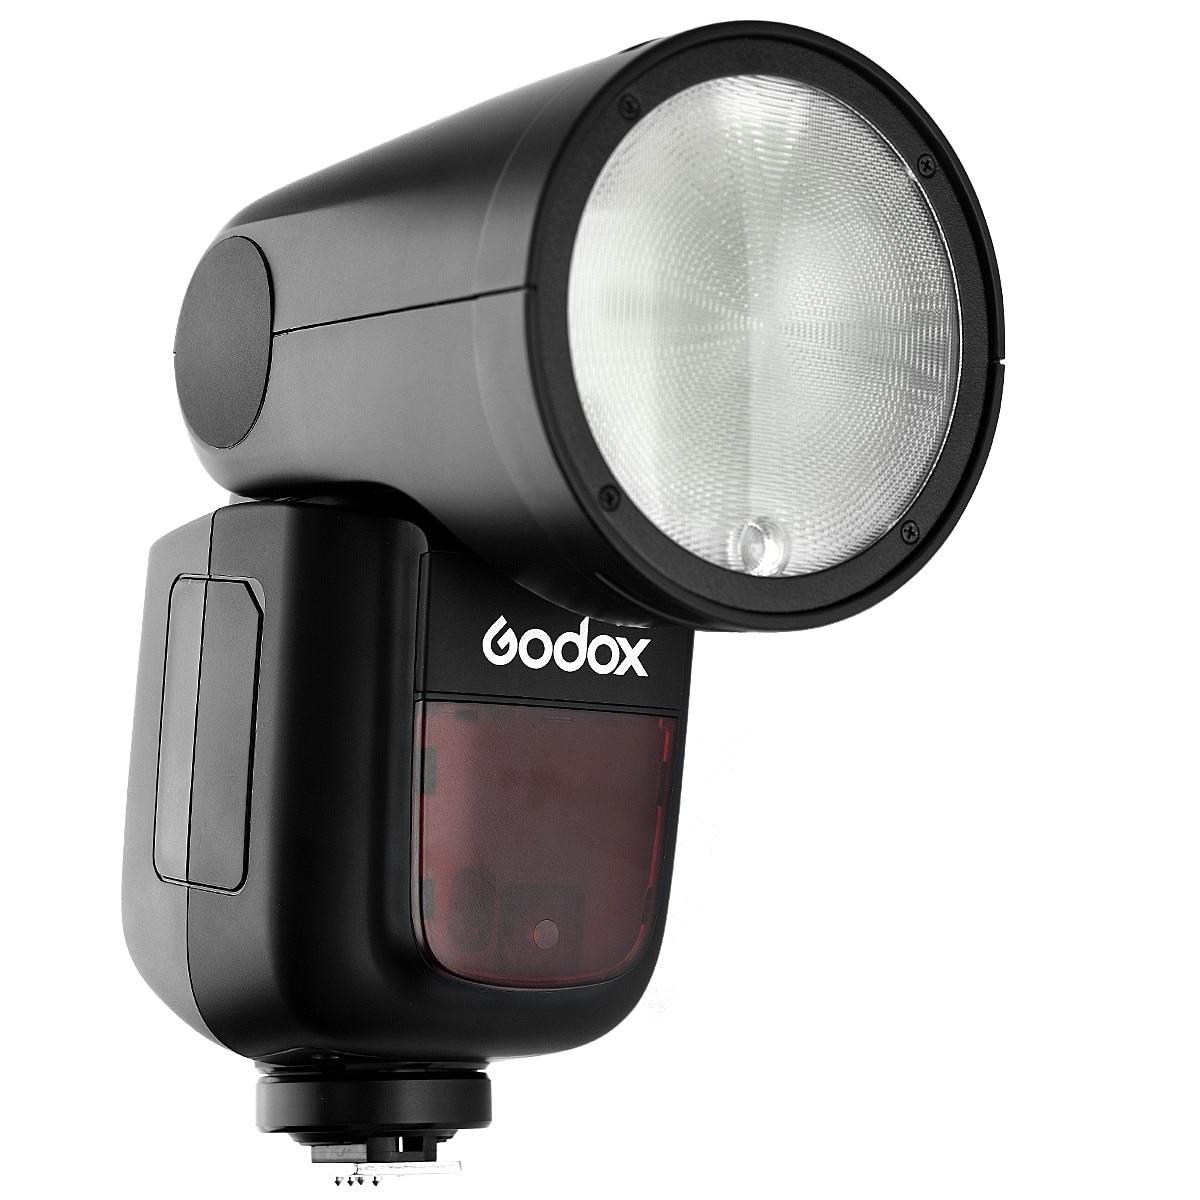 Godox V1 V1-C V1C li-on TTL caméra Flash rond Flash pour Canon EOS 700D 750D 800D 5D3 MARK II 5D2 5D4 600D 1300D 400D 650D